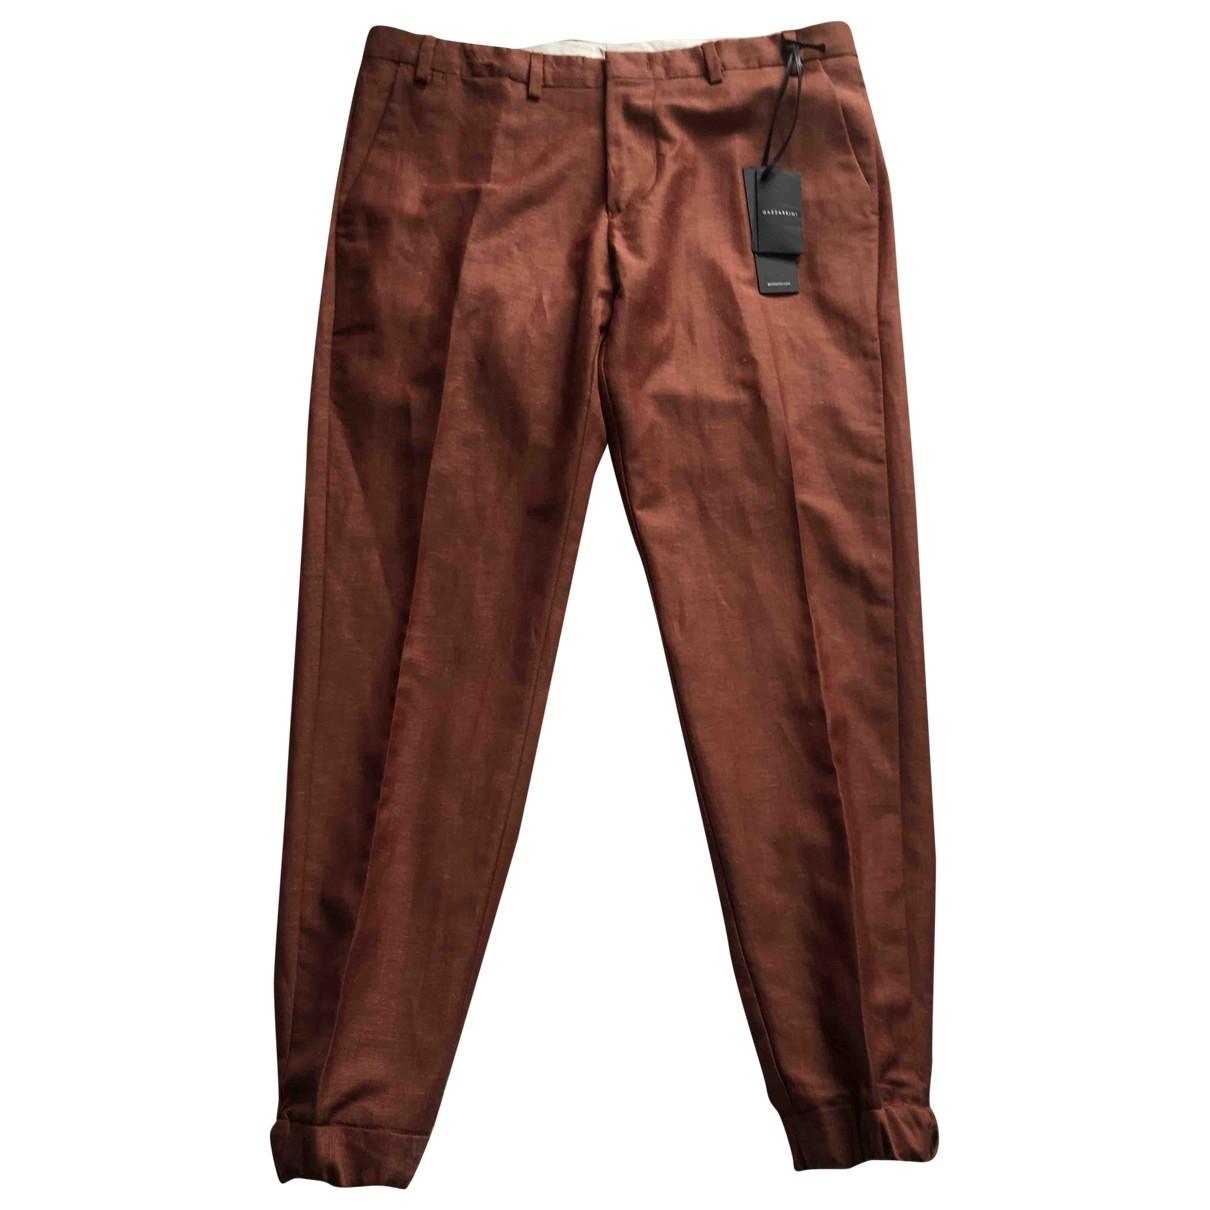 Pantalon de Lana Non Signe / Unsigned